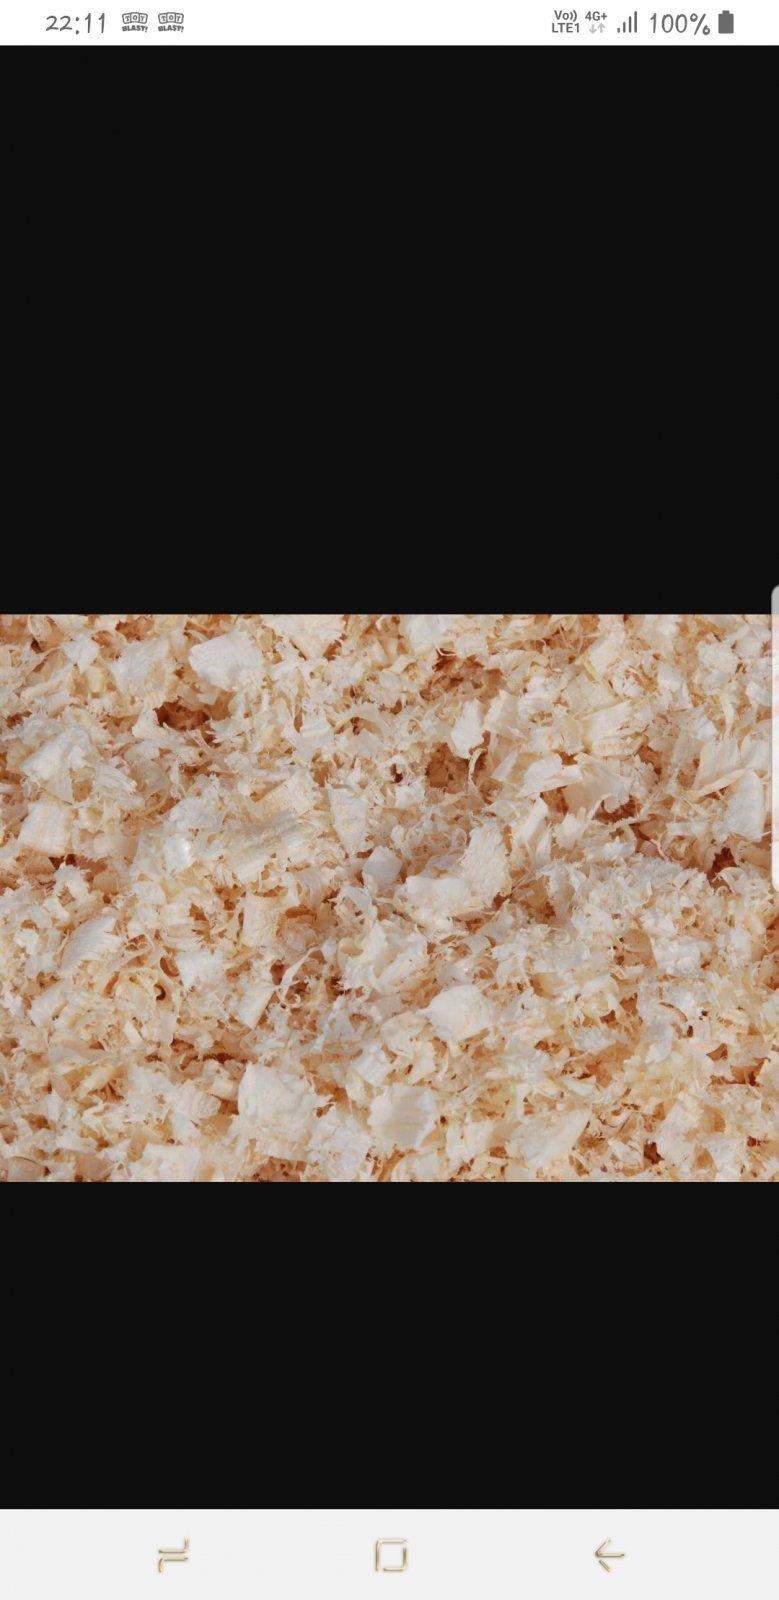 Screenshot_20190425-221145_Samsung Internet.jpg